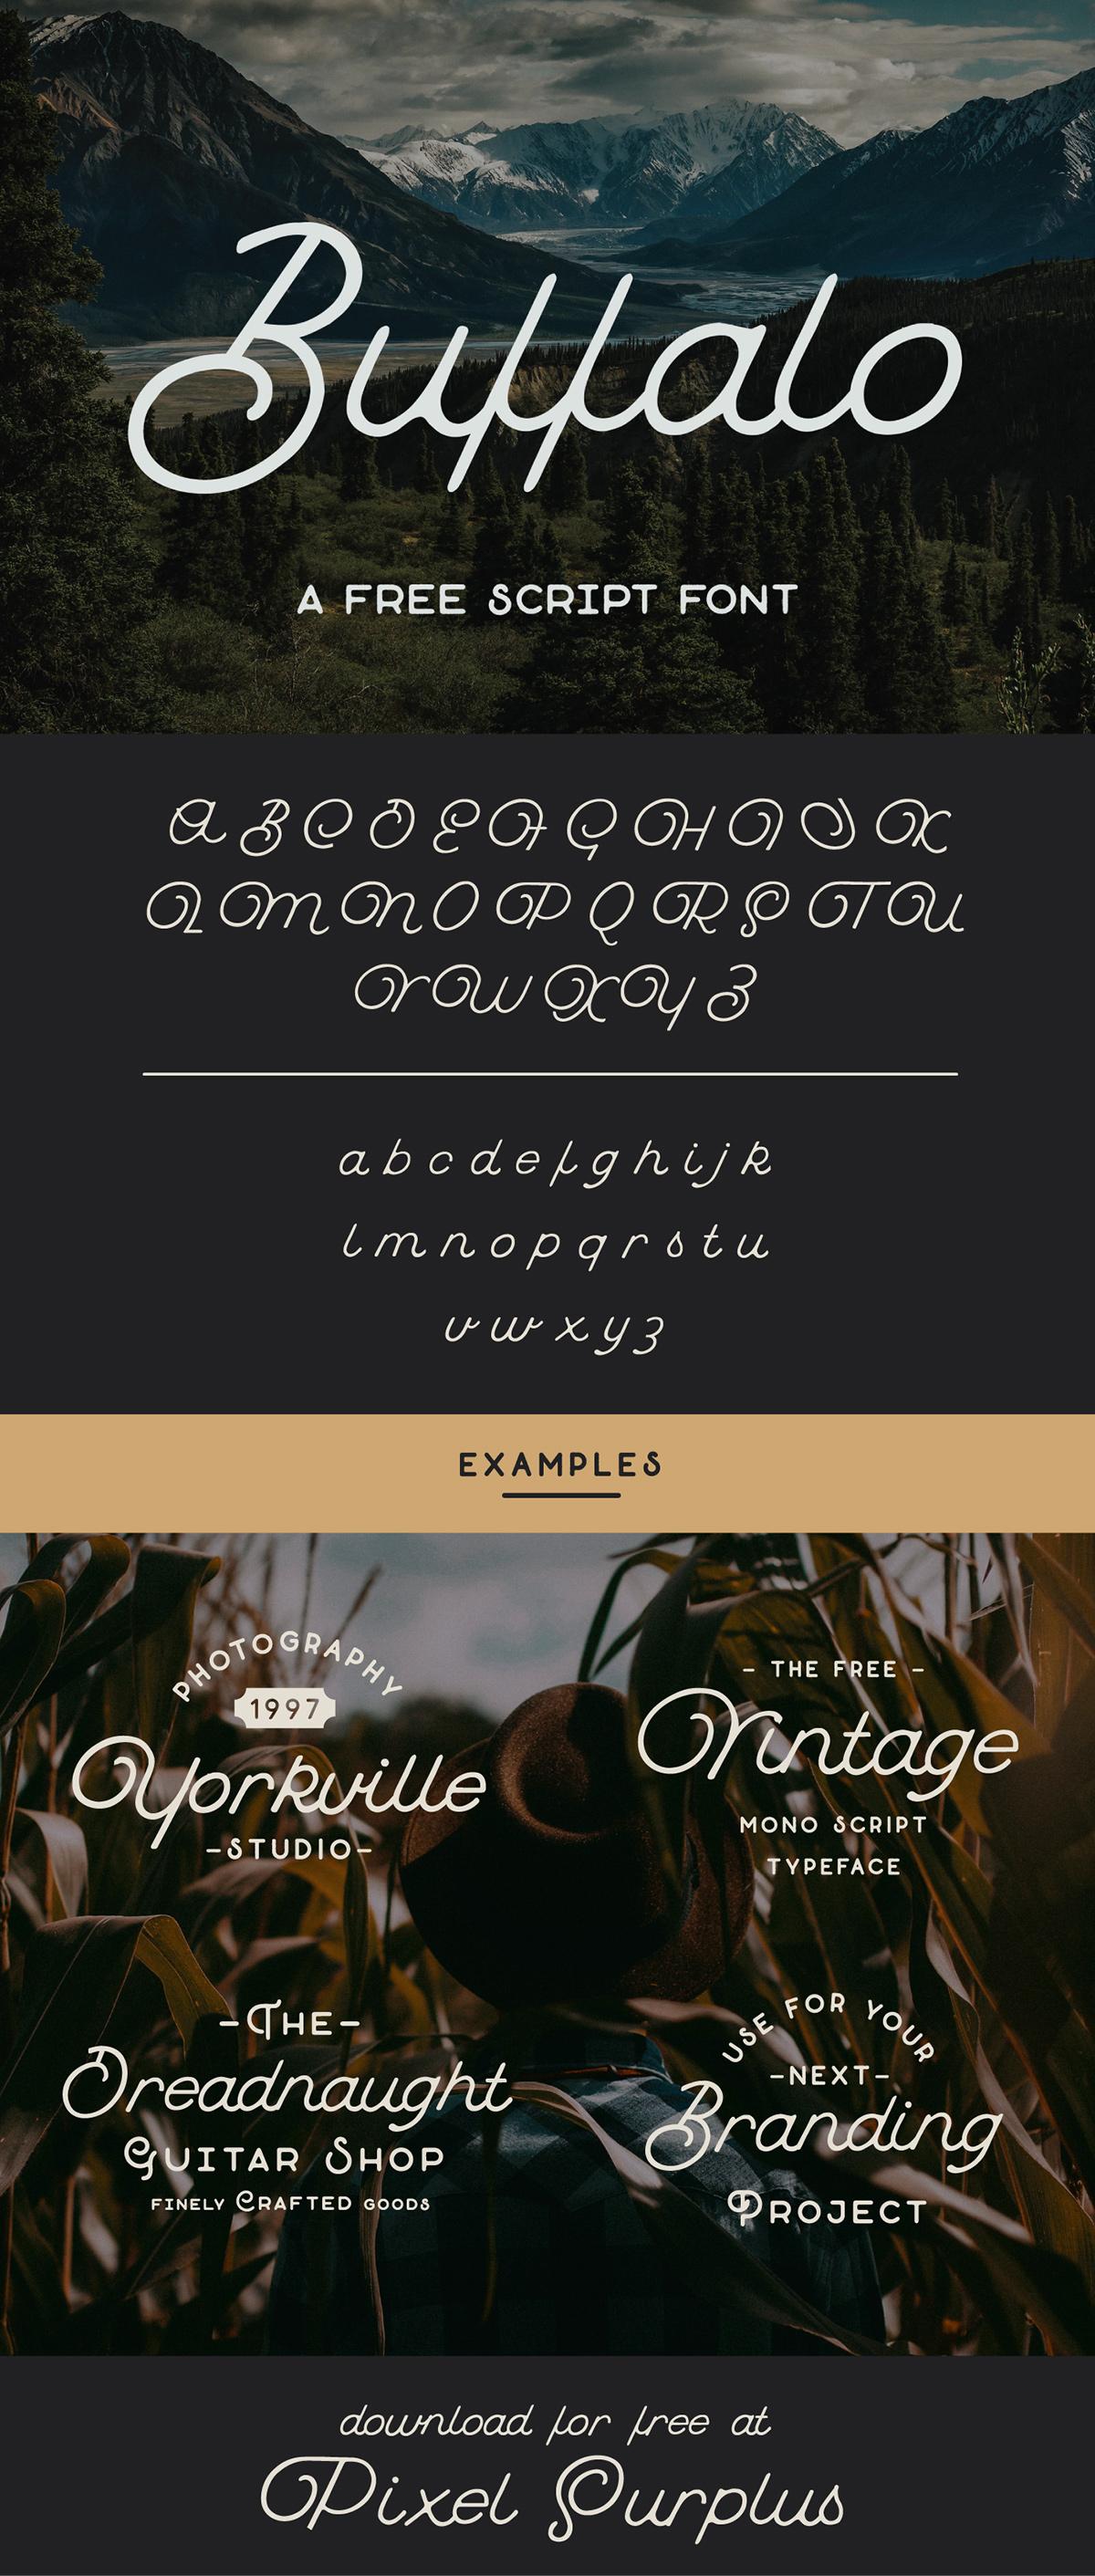 free Free font free fonts freebie freebies Script Script Font monoline monoline font font fonts vintage freebie font Display